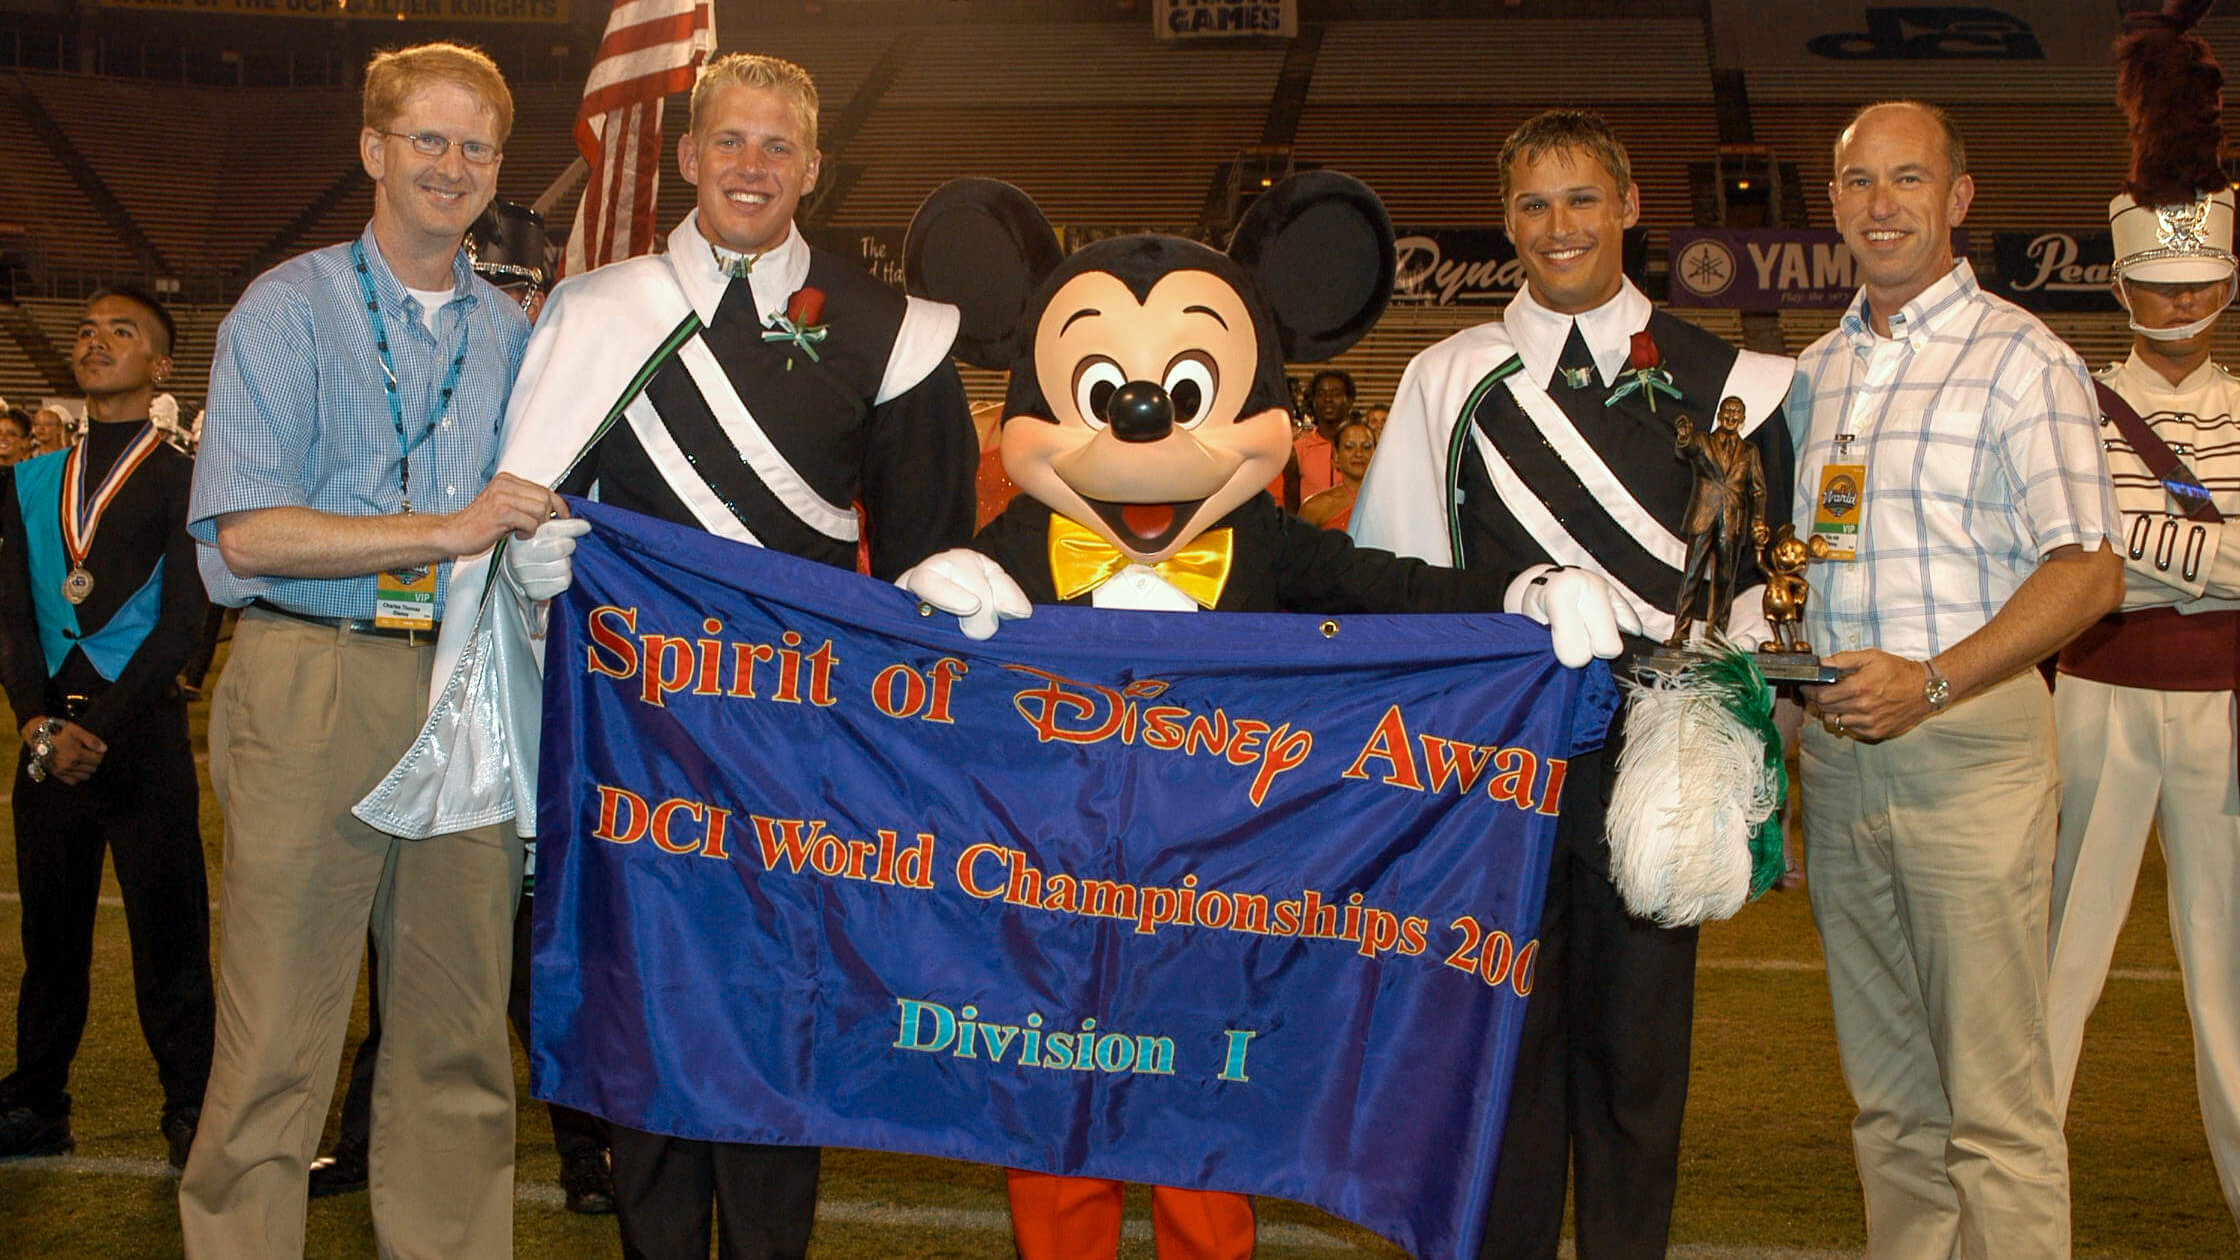 All 41 of DCI's Spirit of Disney Award winners